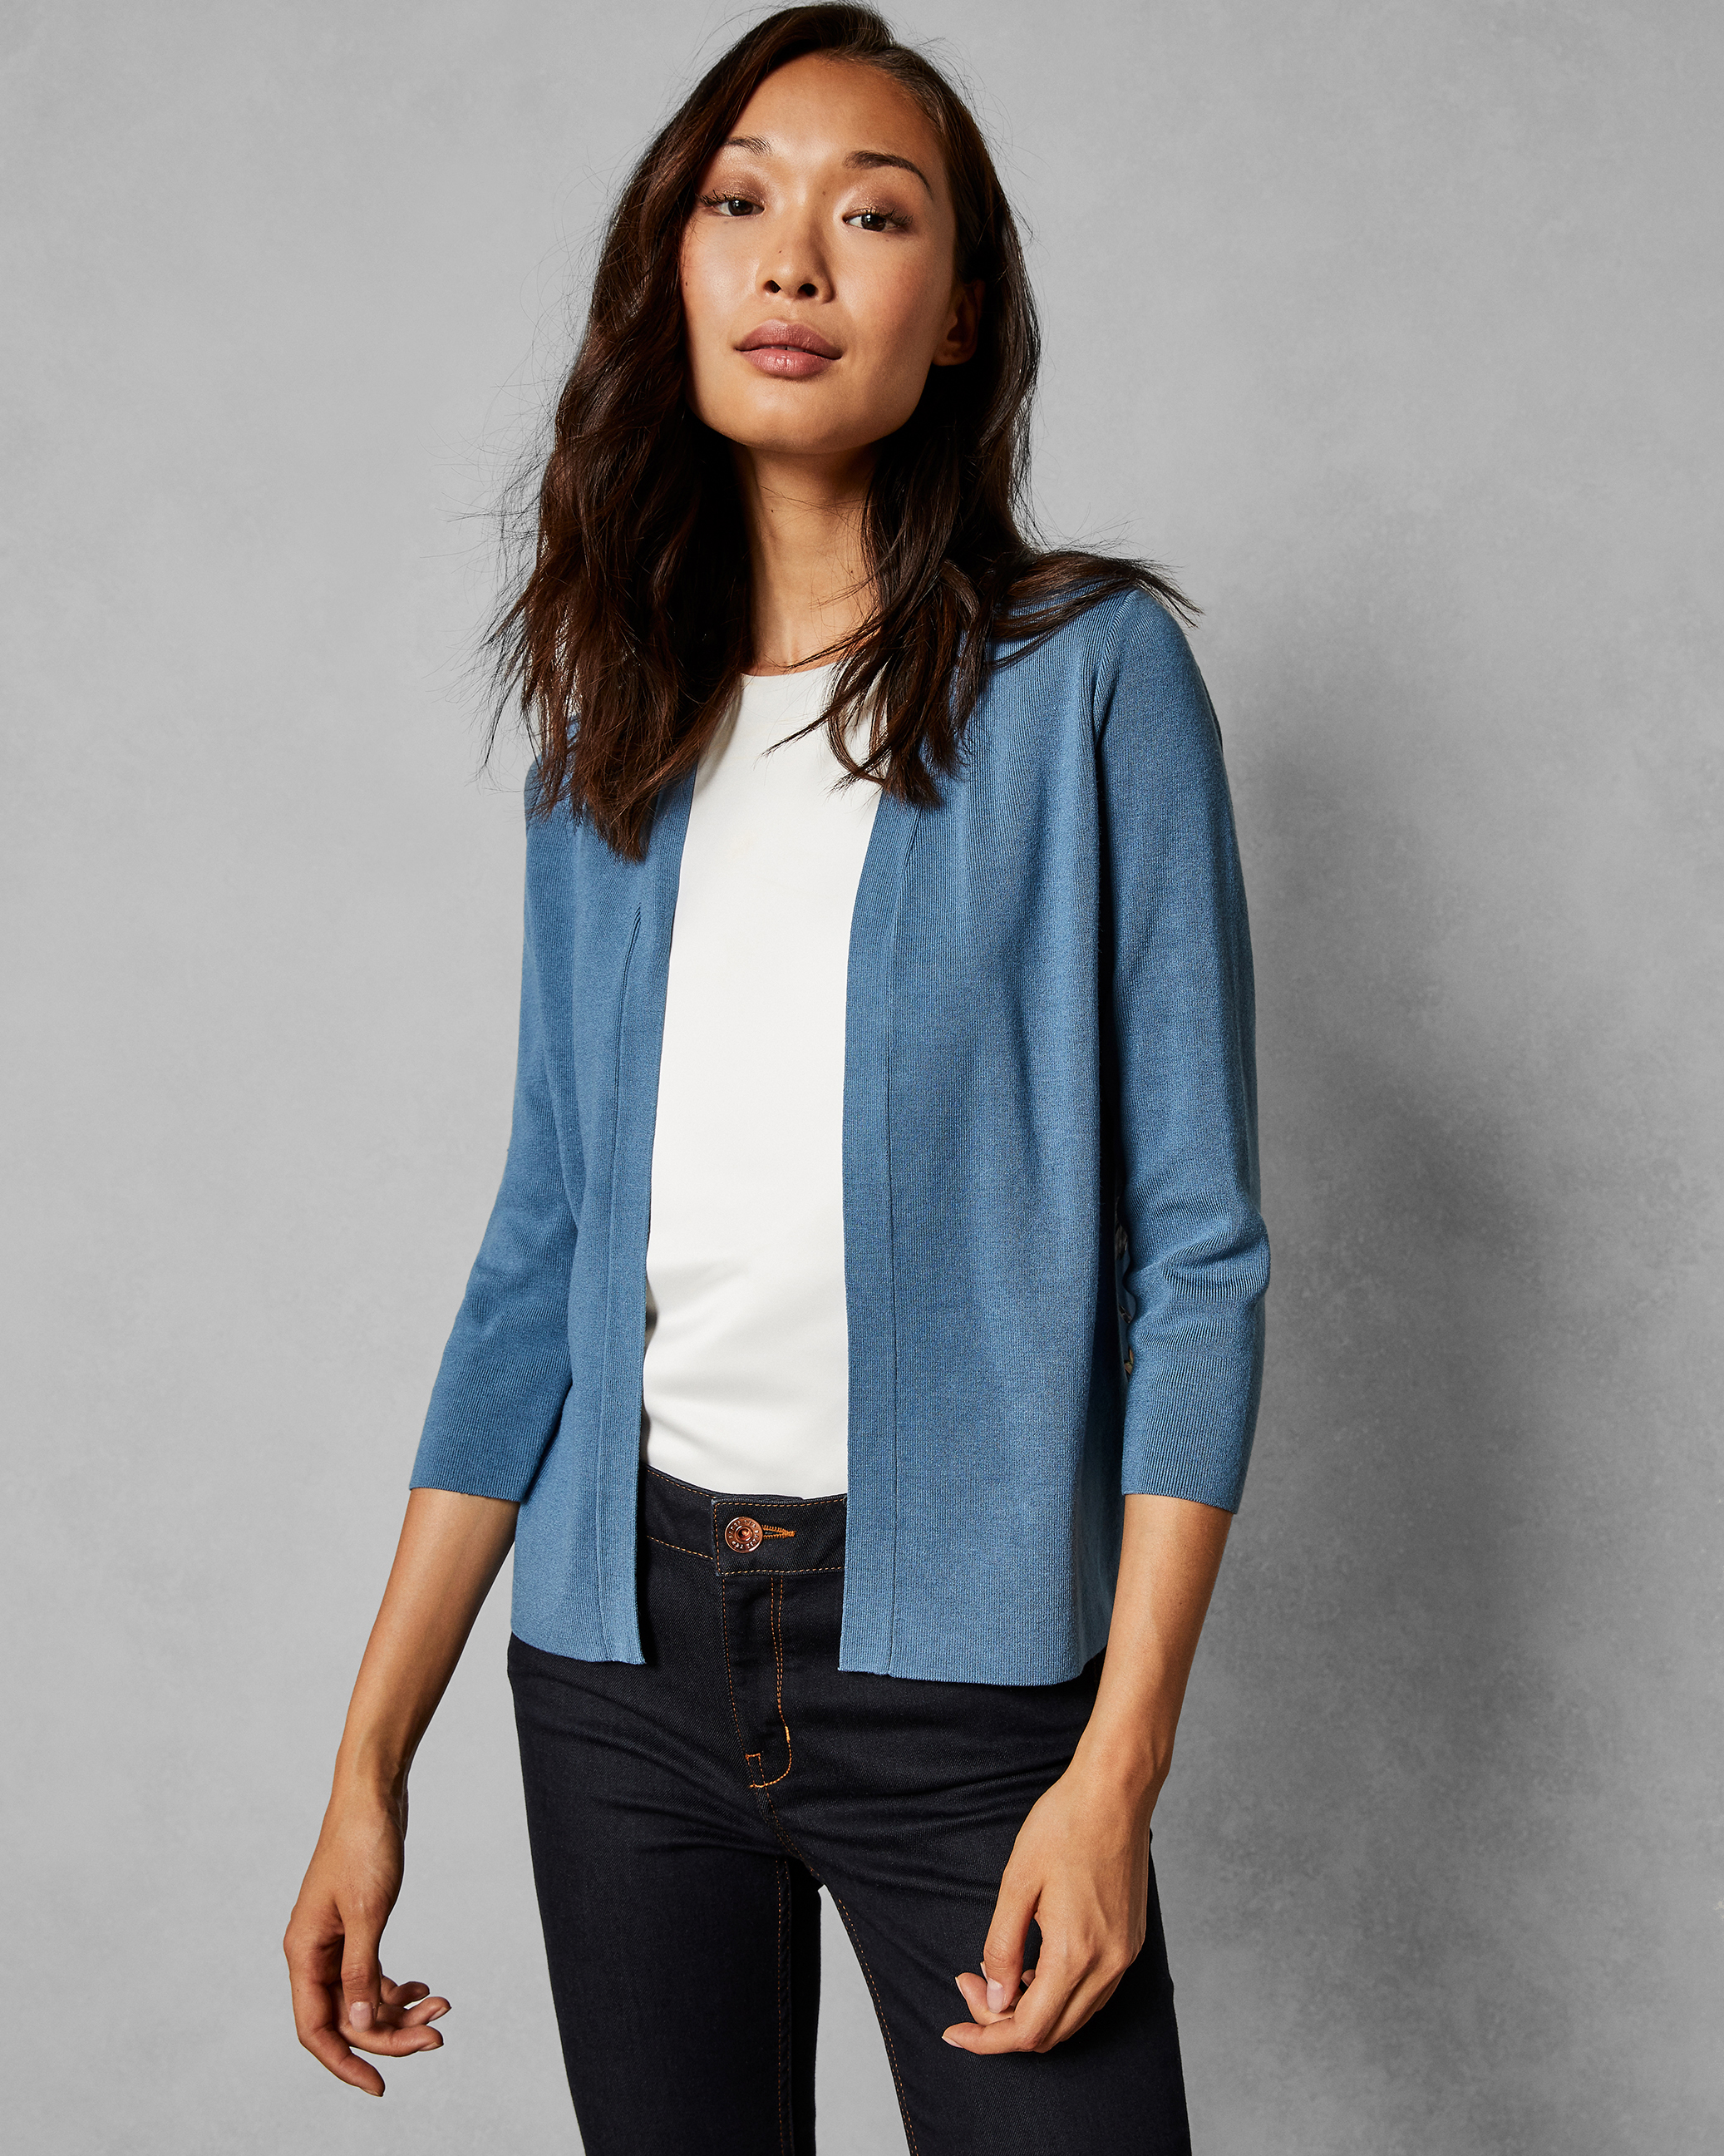 Narrnia printed back cardigan Mid Blue | Knitwear | Ted